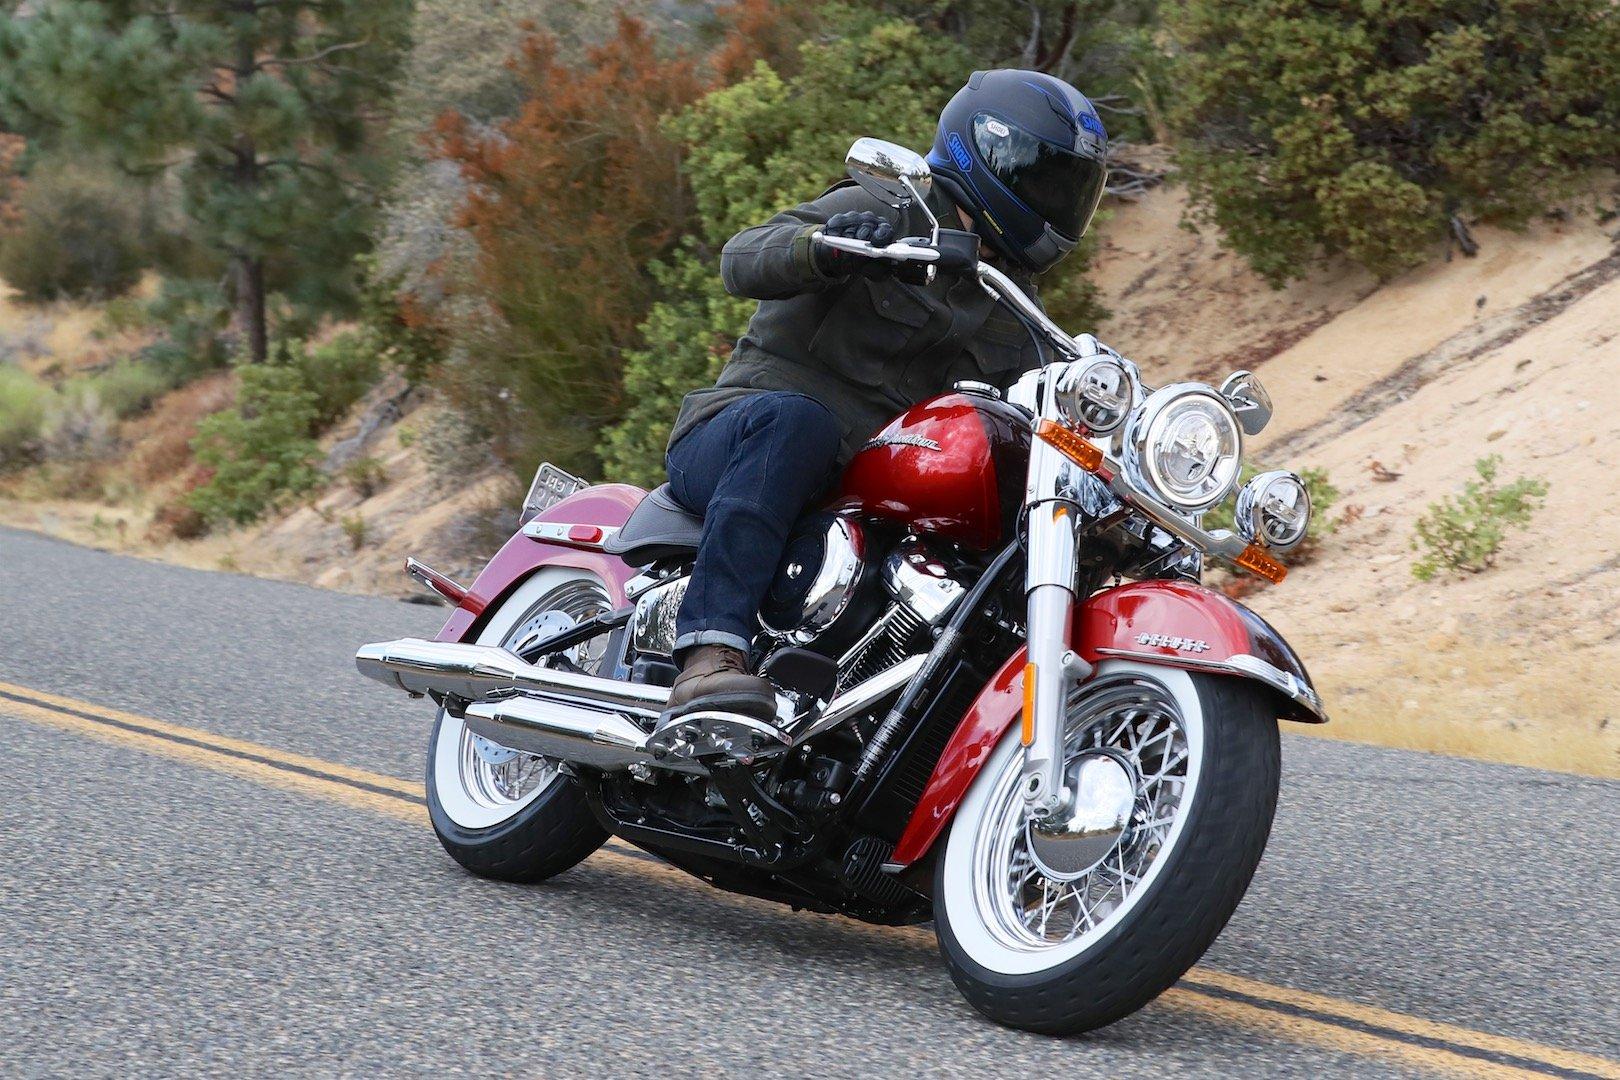 Harley Davidson: 2018 Harley-Davidson Deluxe Review